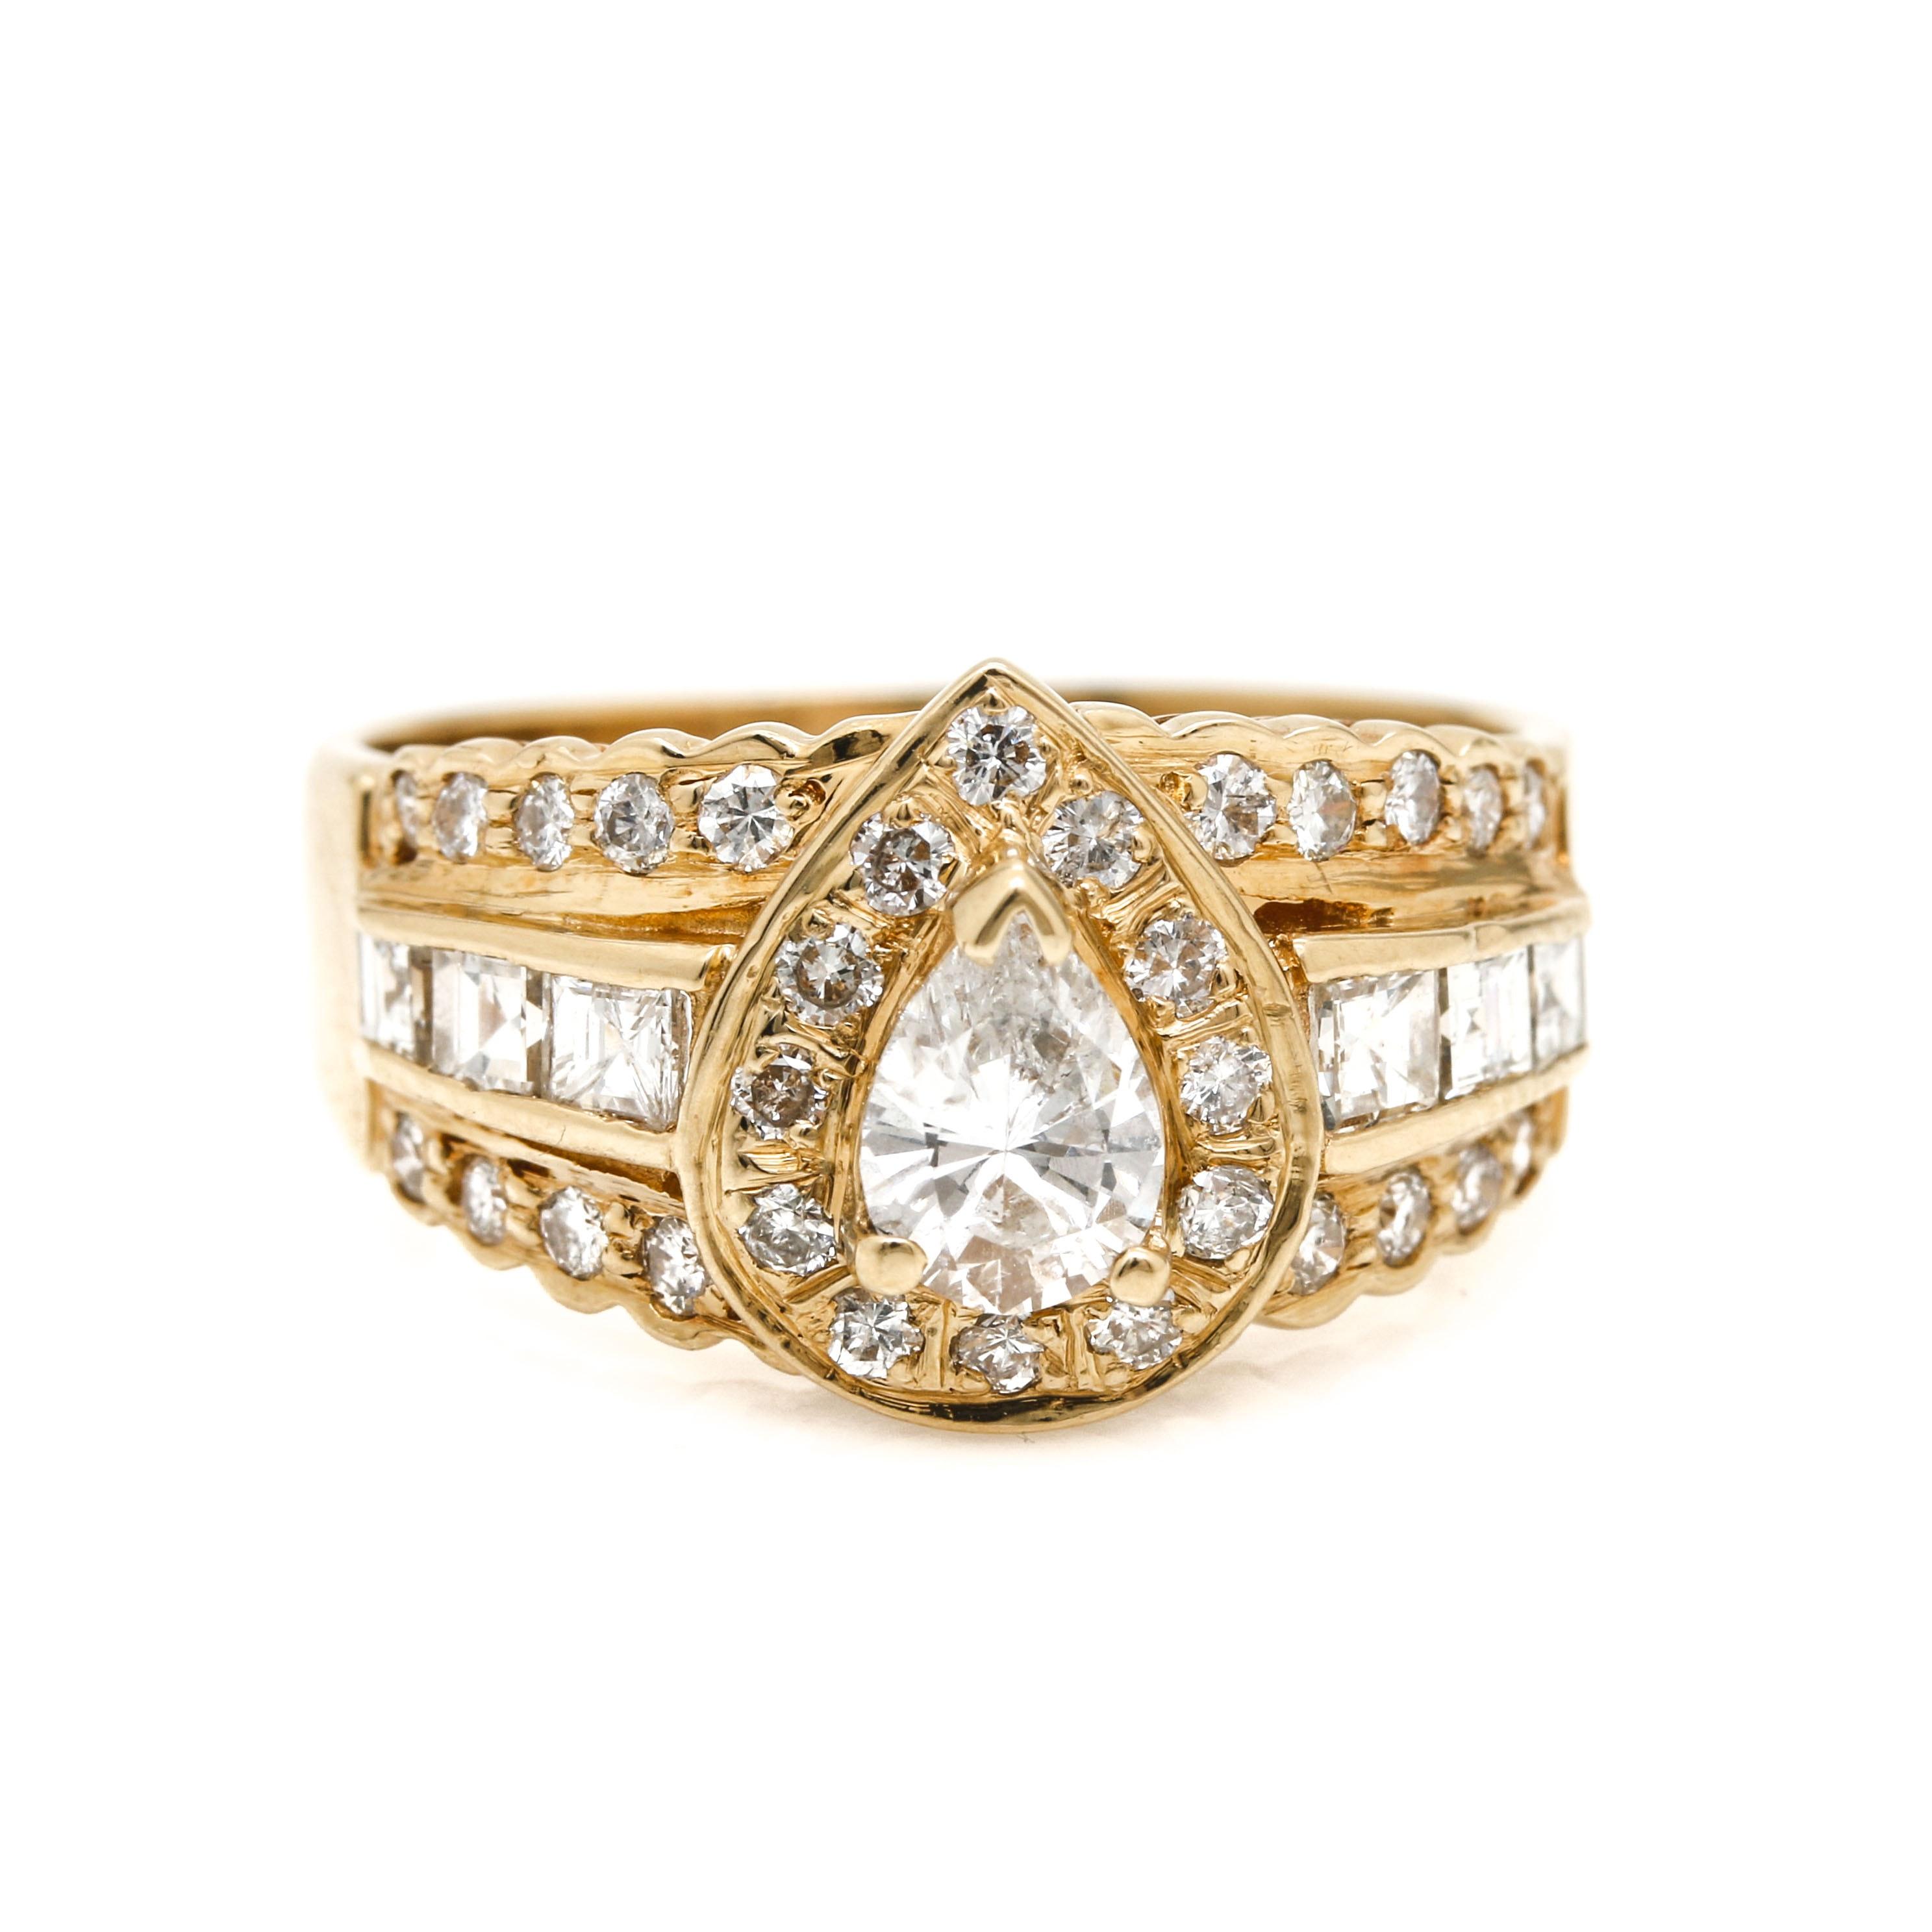 14K Yellow Gold 1.36 CTW Diamond Ring